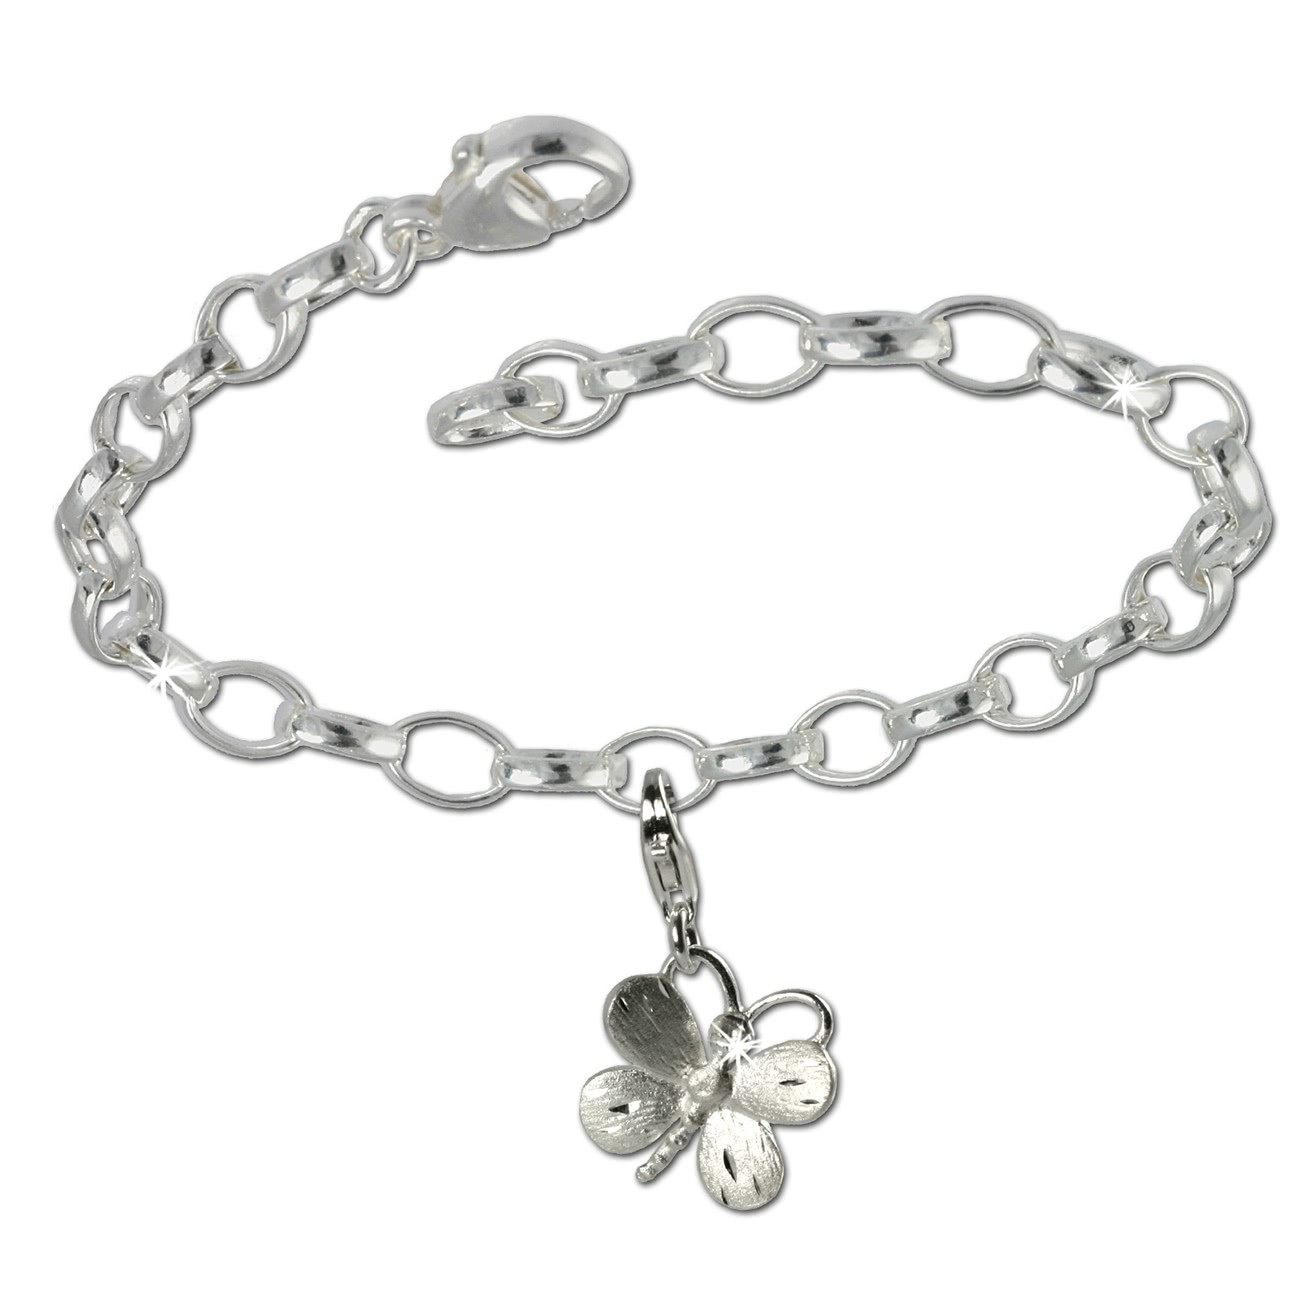 SilberDream 925 Charm Set Schmetterling Silber Armband Anhänger FCA134